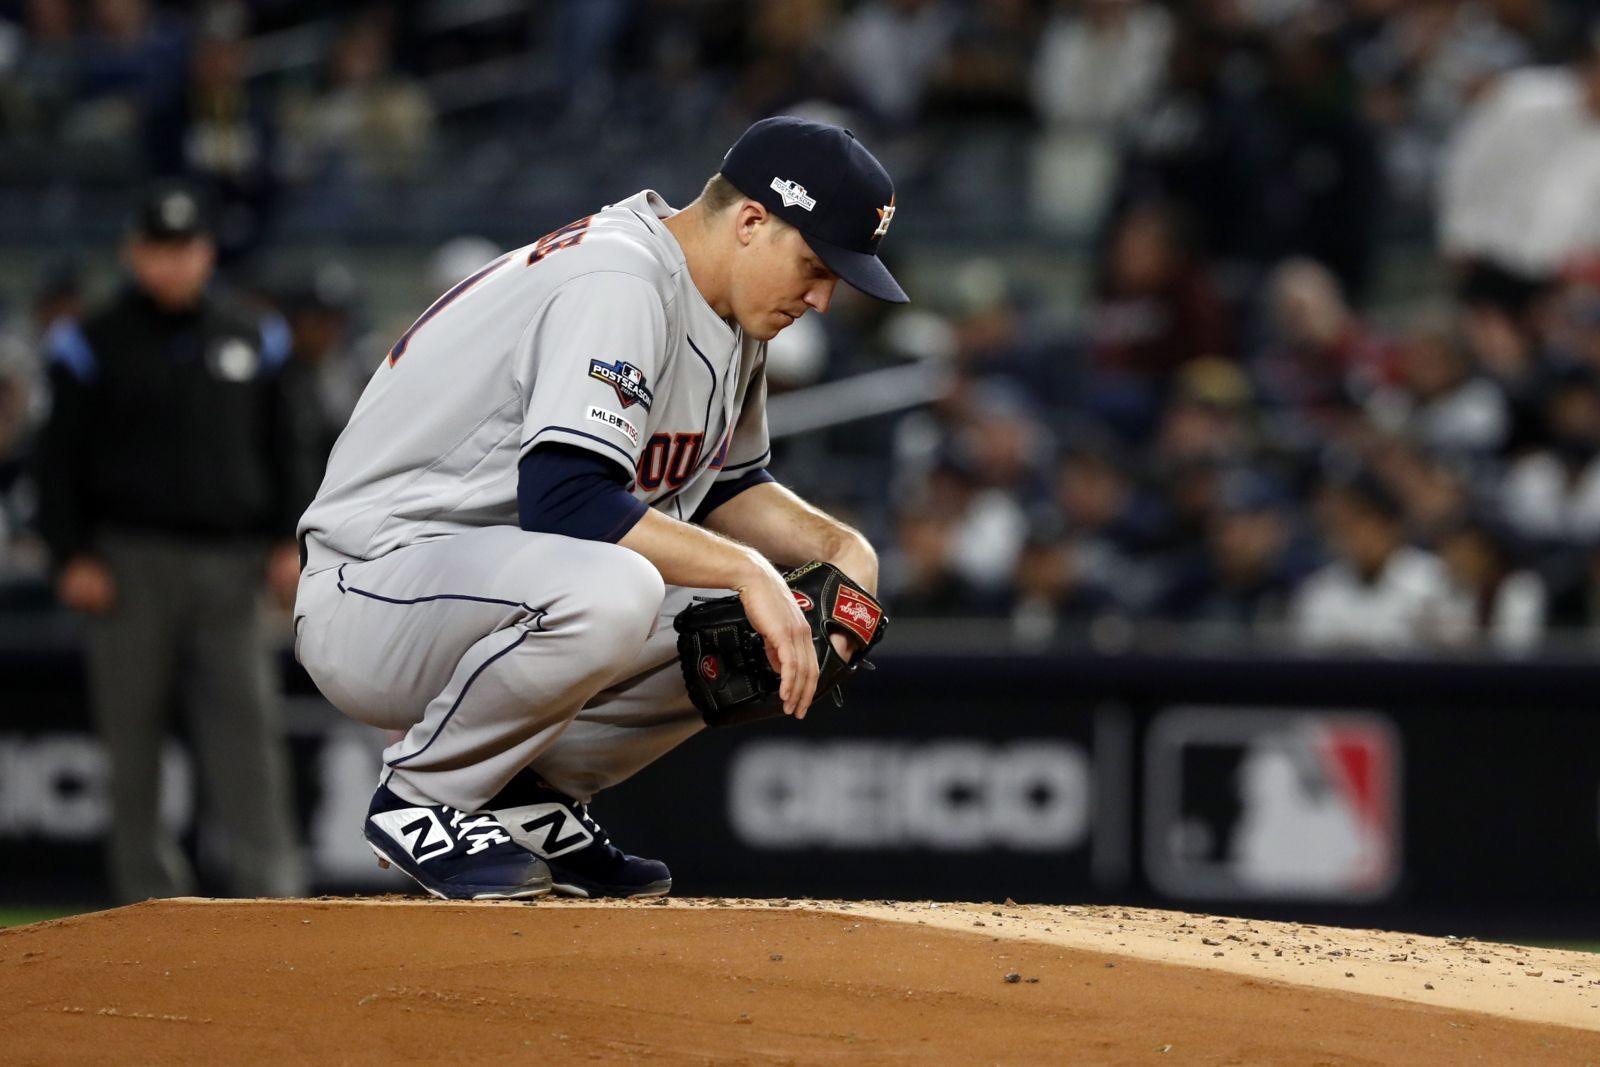 Houston Astros Zack Greinke Will Face Intense Pressure In Game 3